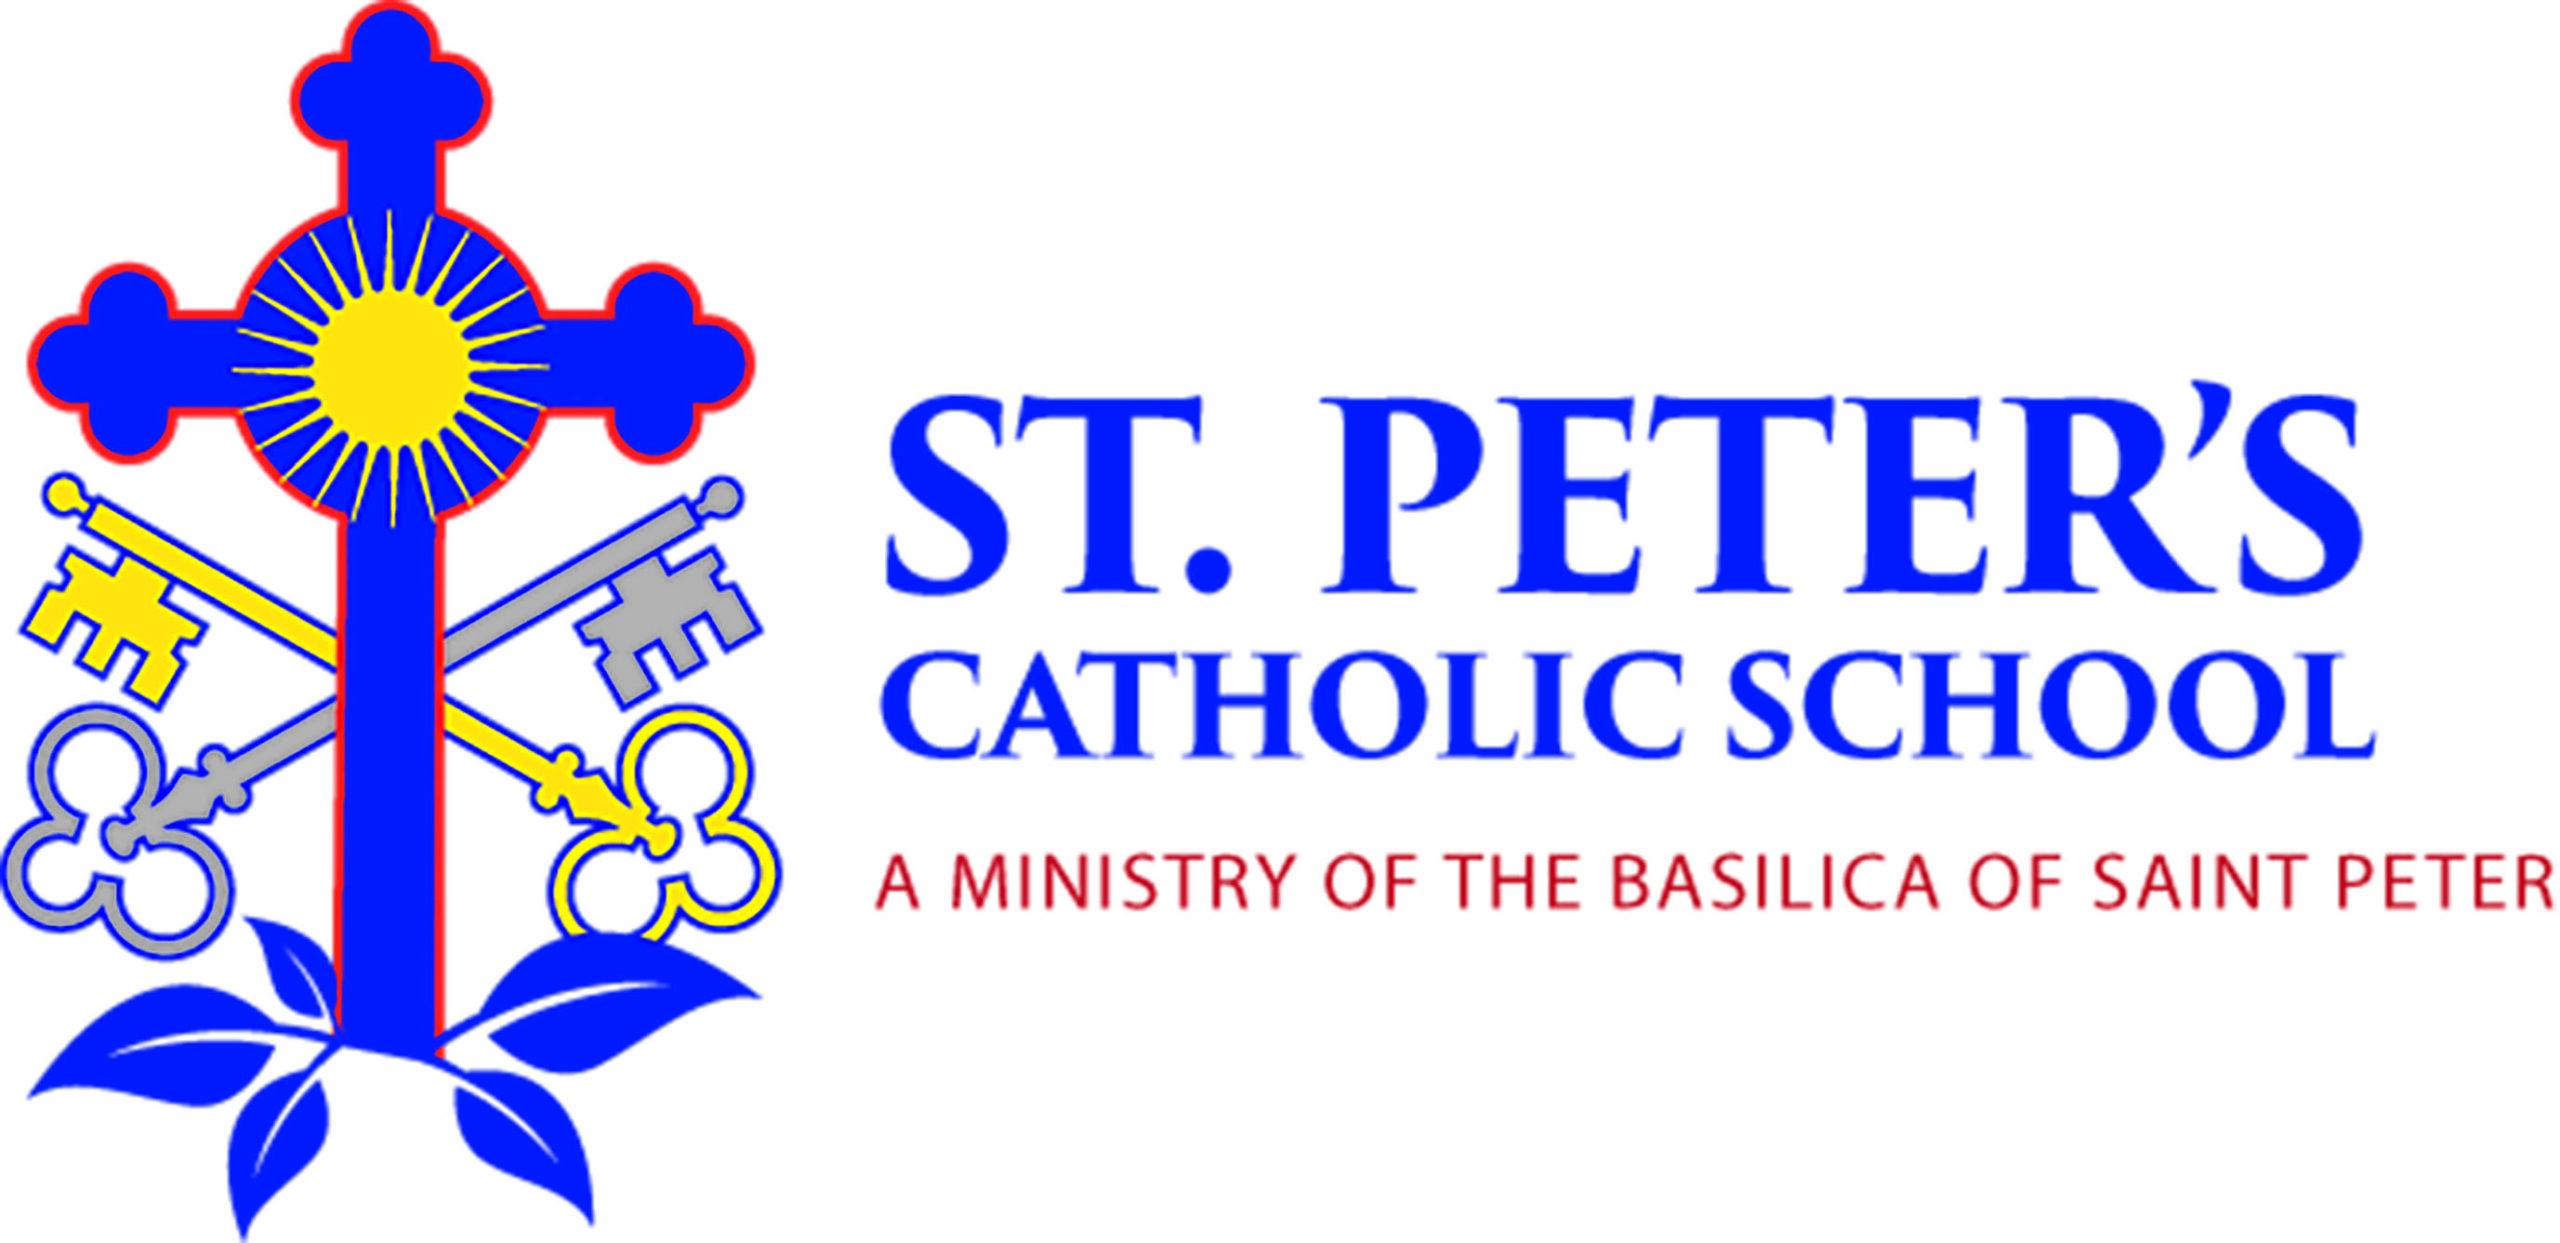 St. Peter's Catholic School of Columbia SC